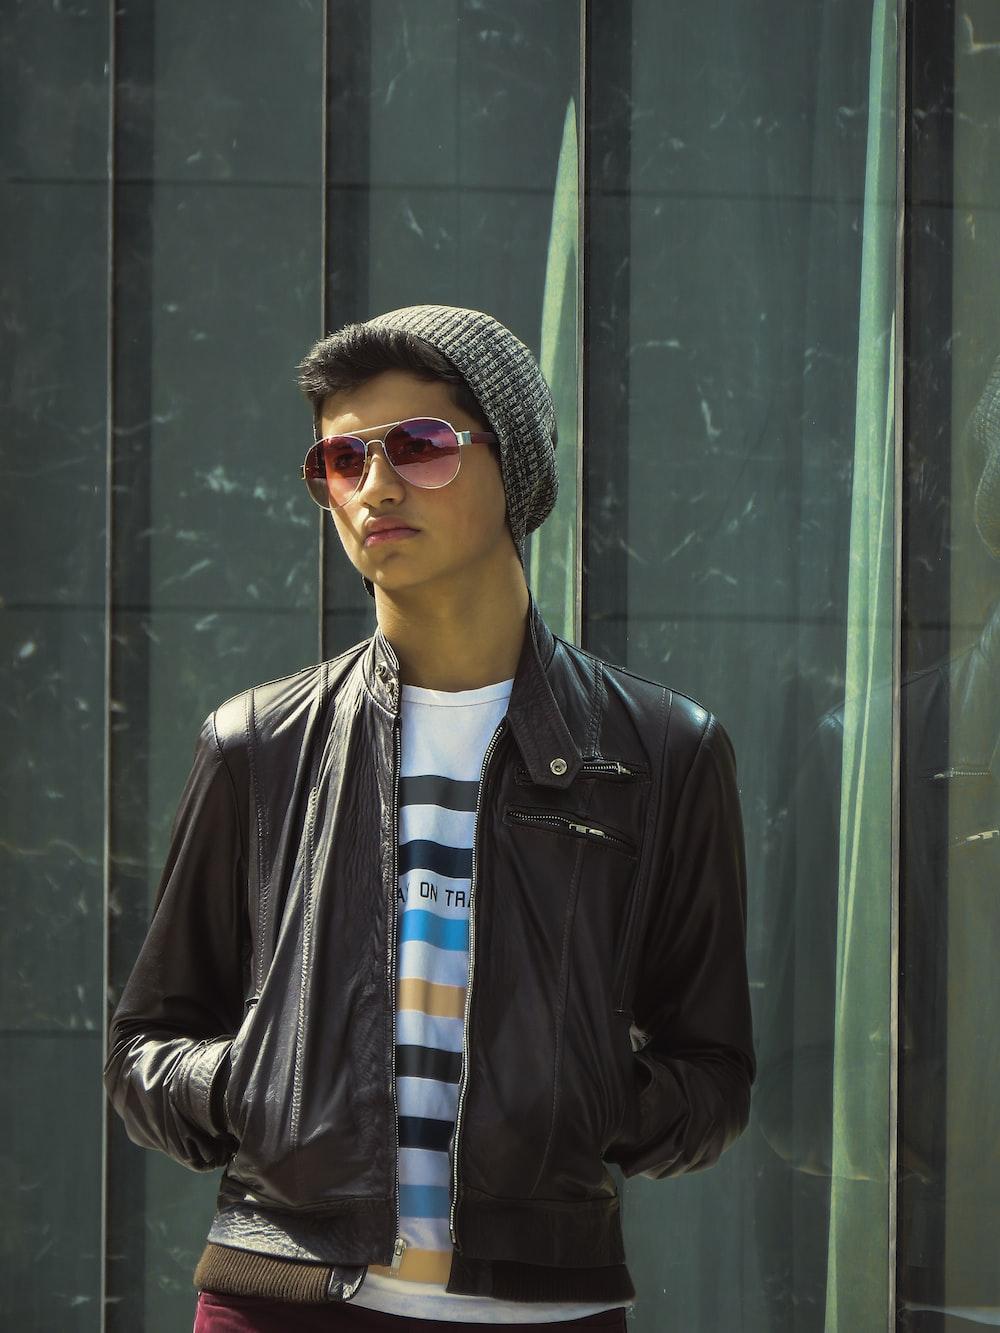 man wearing black leather jacket standing near green wall